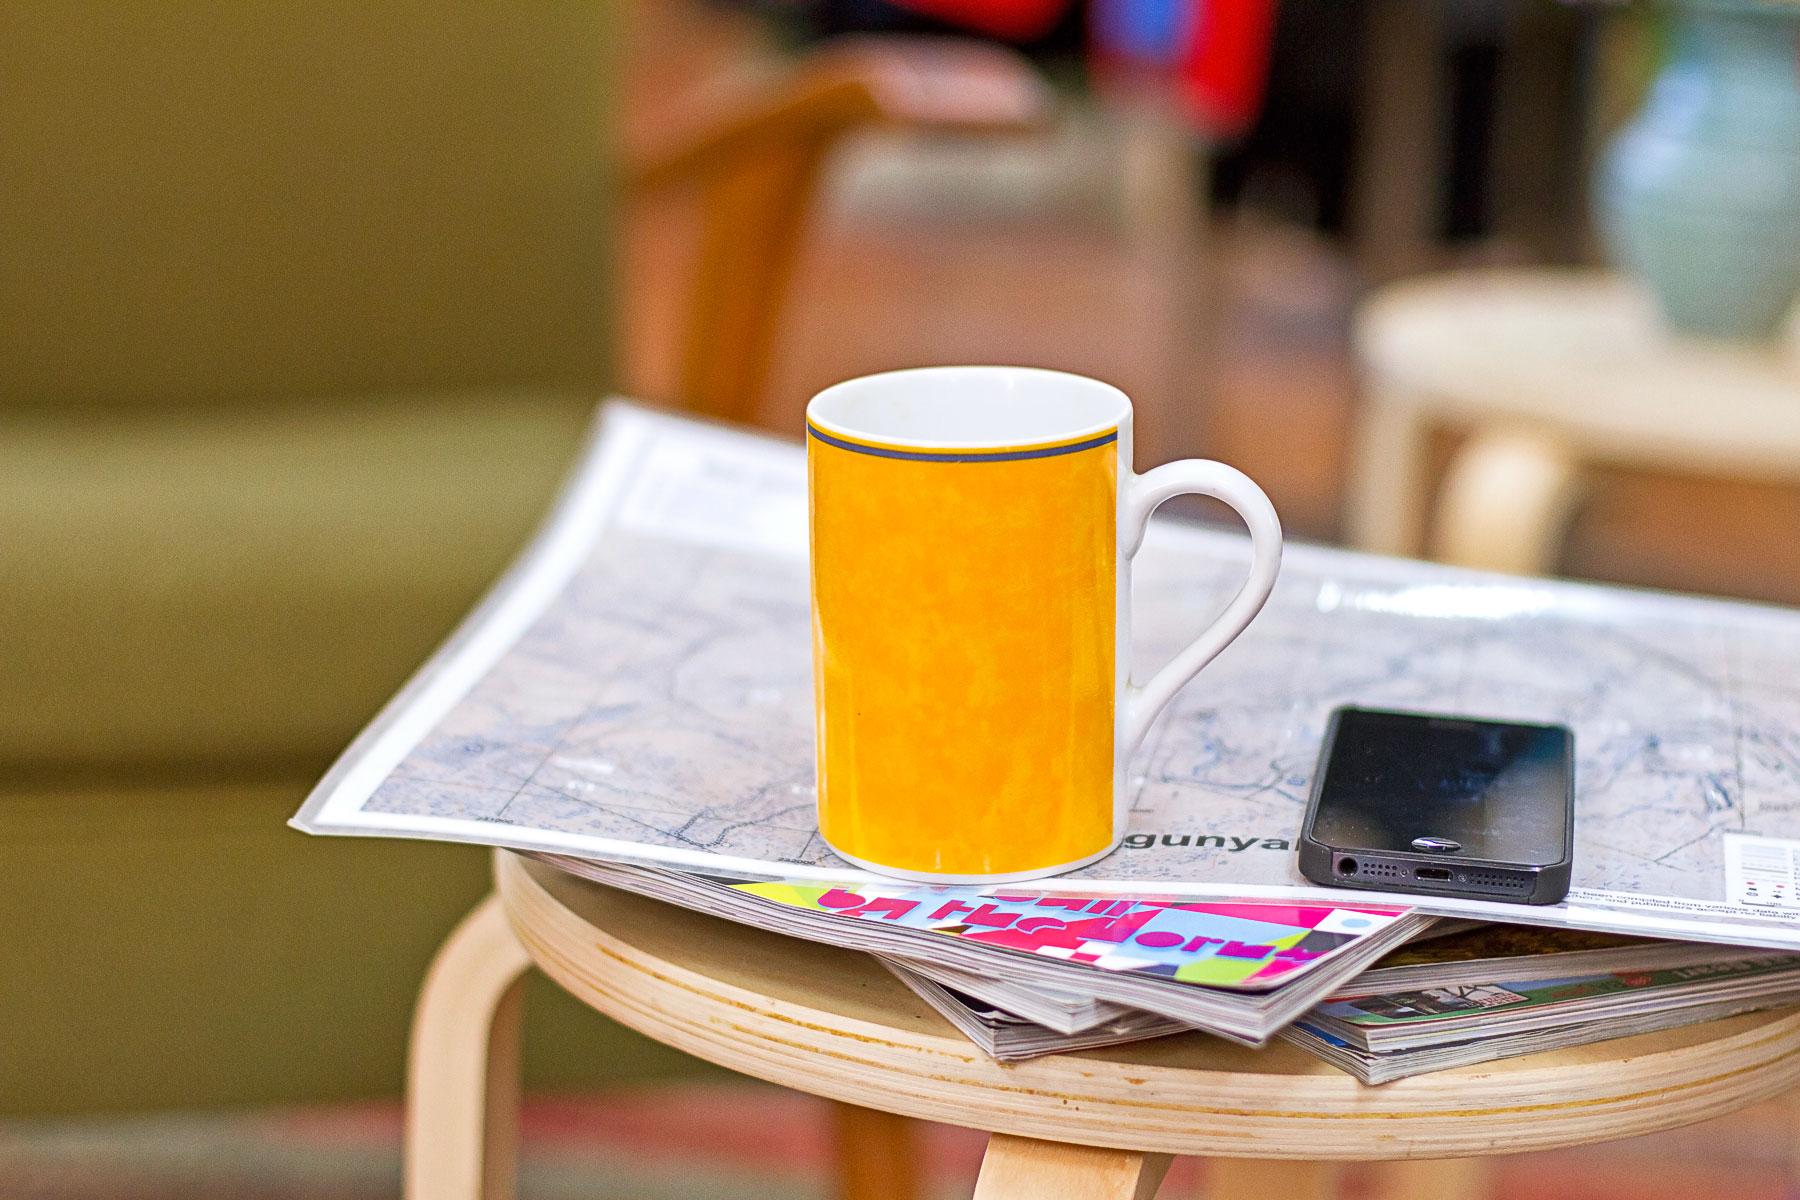 14 Coffe cup & iphone.jpg